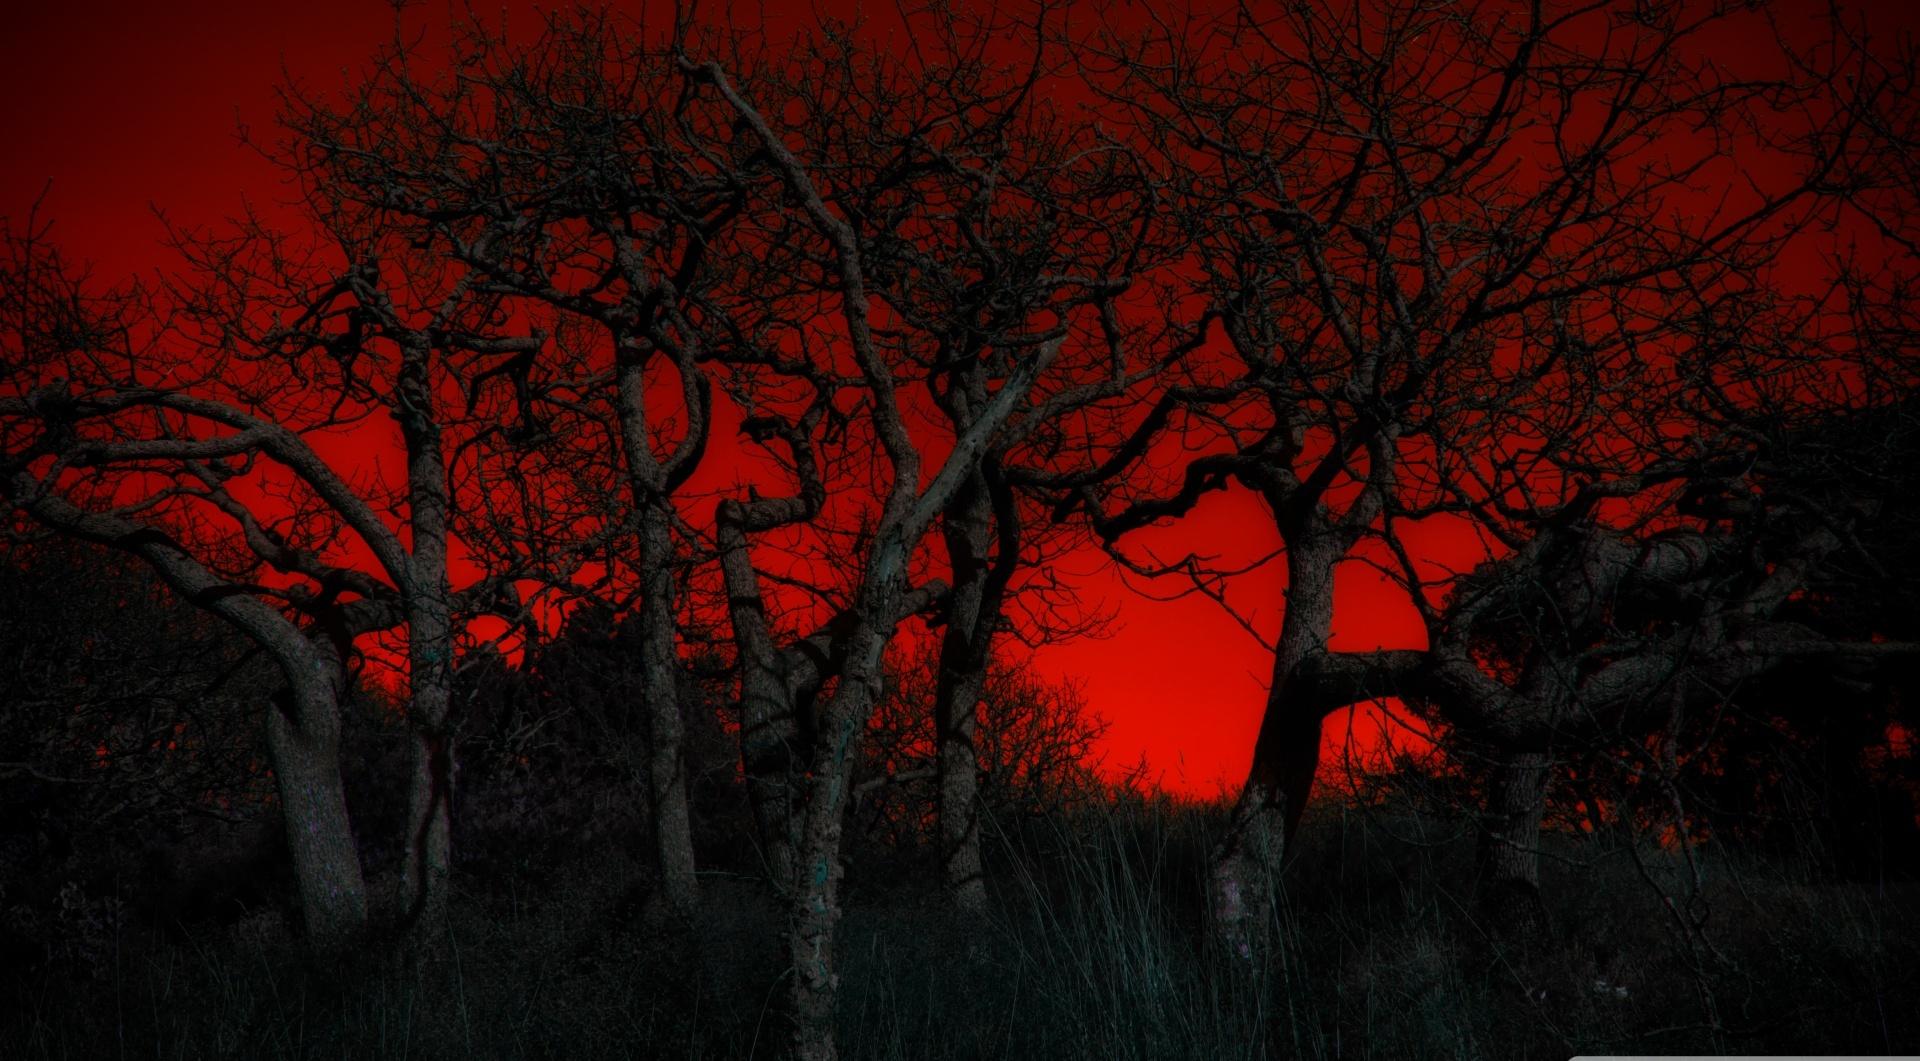 [77+] Hd Red Wallpaper on WallpaperSafari